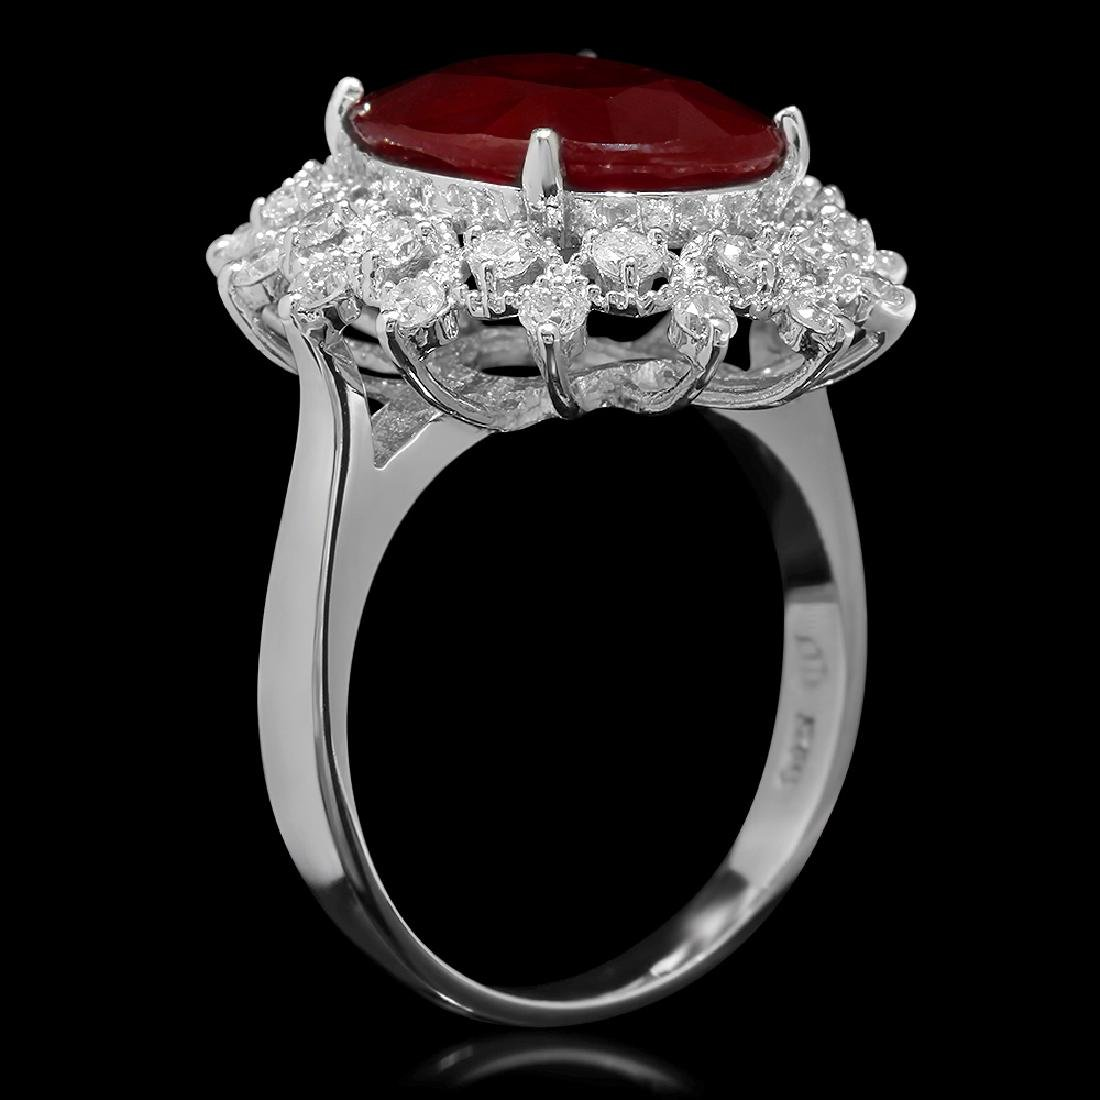 14K Gold 6.06ct Ruby 0.71ct Diamond Ring - 2